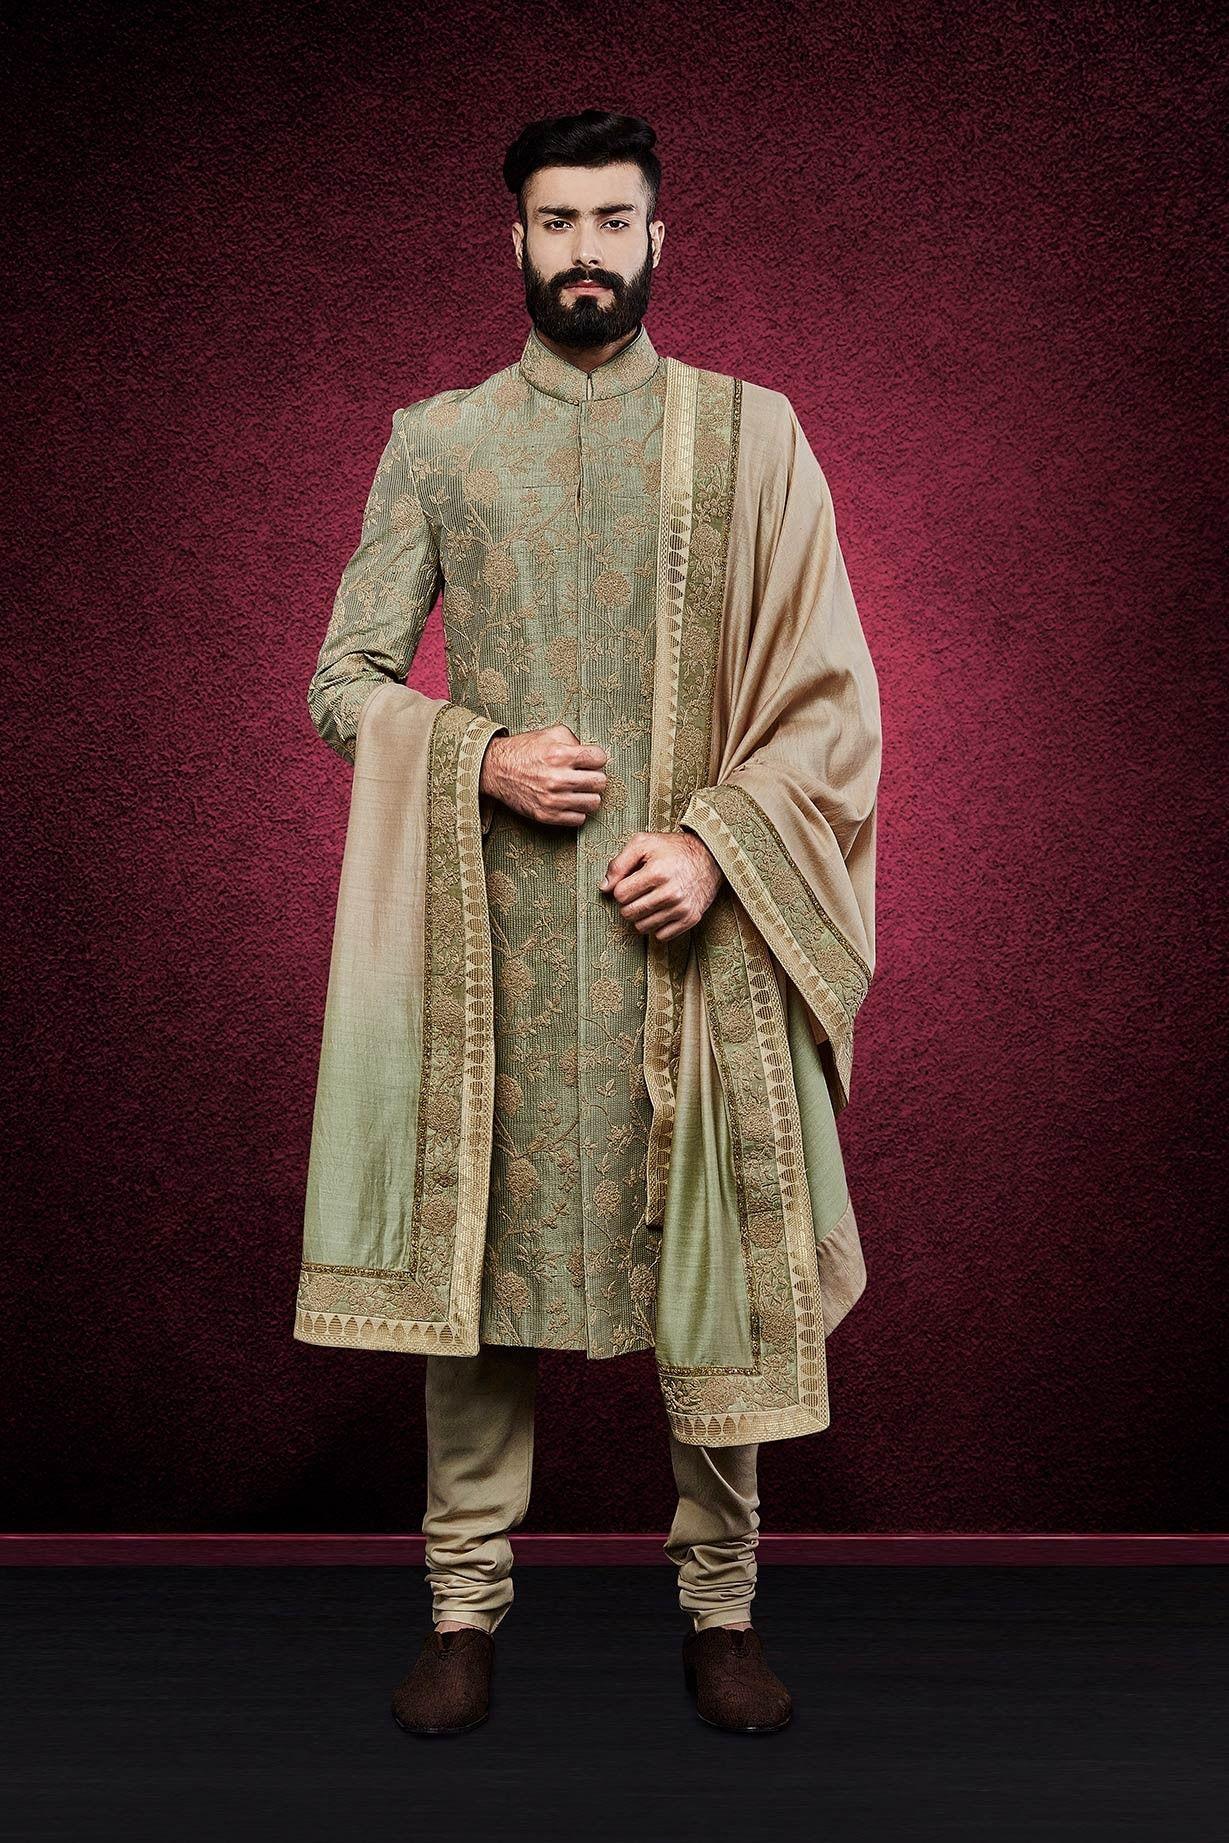 Pin by Ayaz Mahadiwala on Ethnic Wear   Pinterest   Sherwani, Indian ...